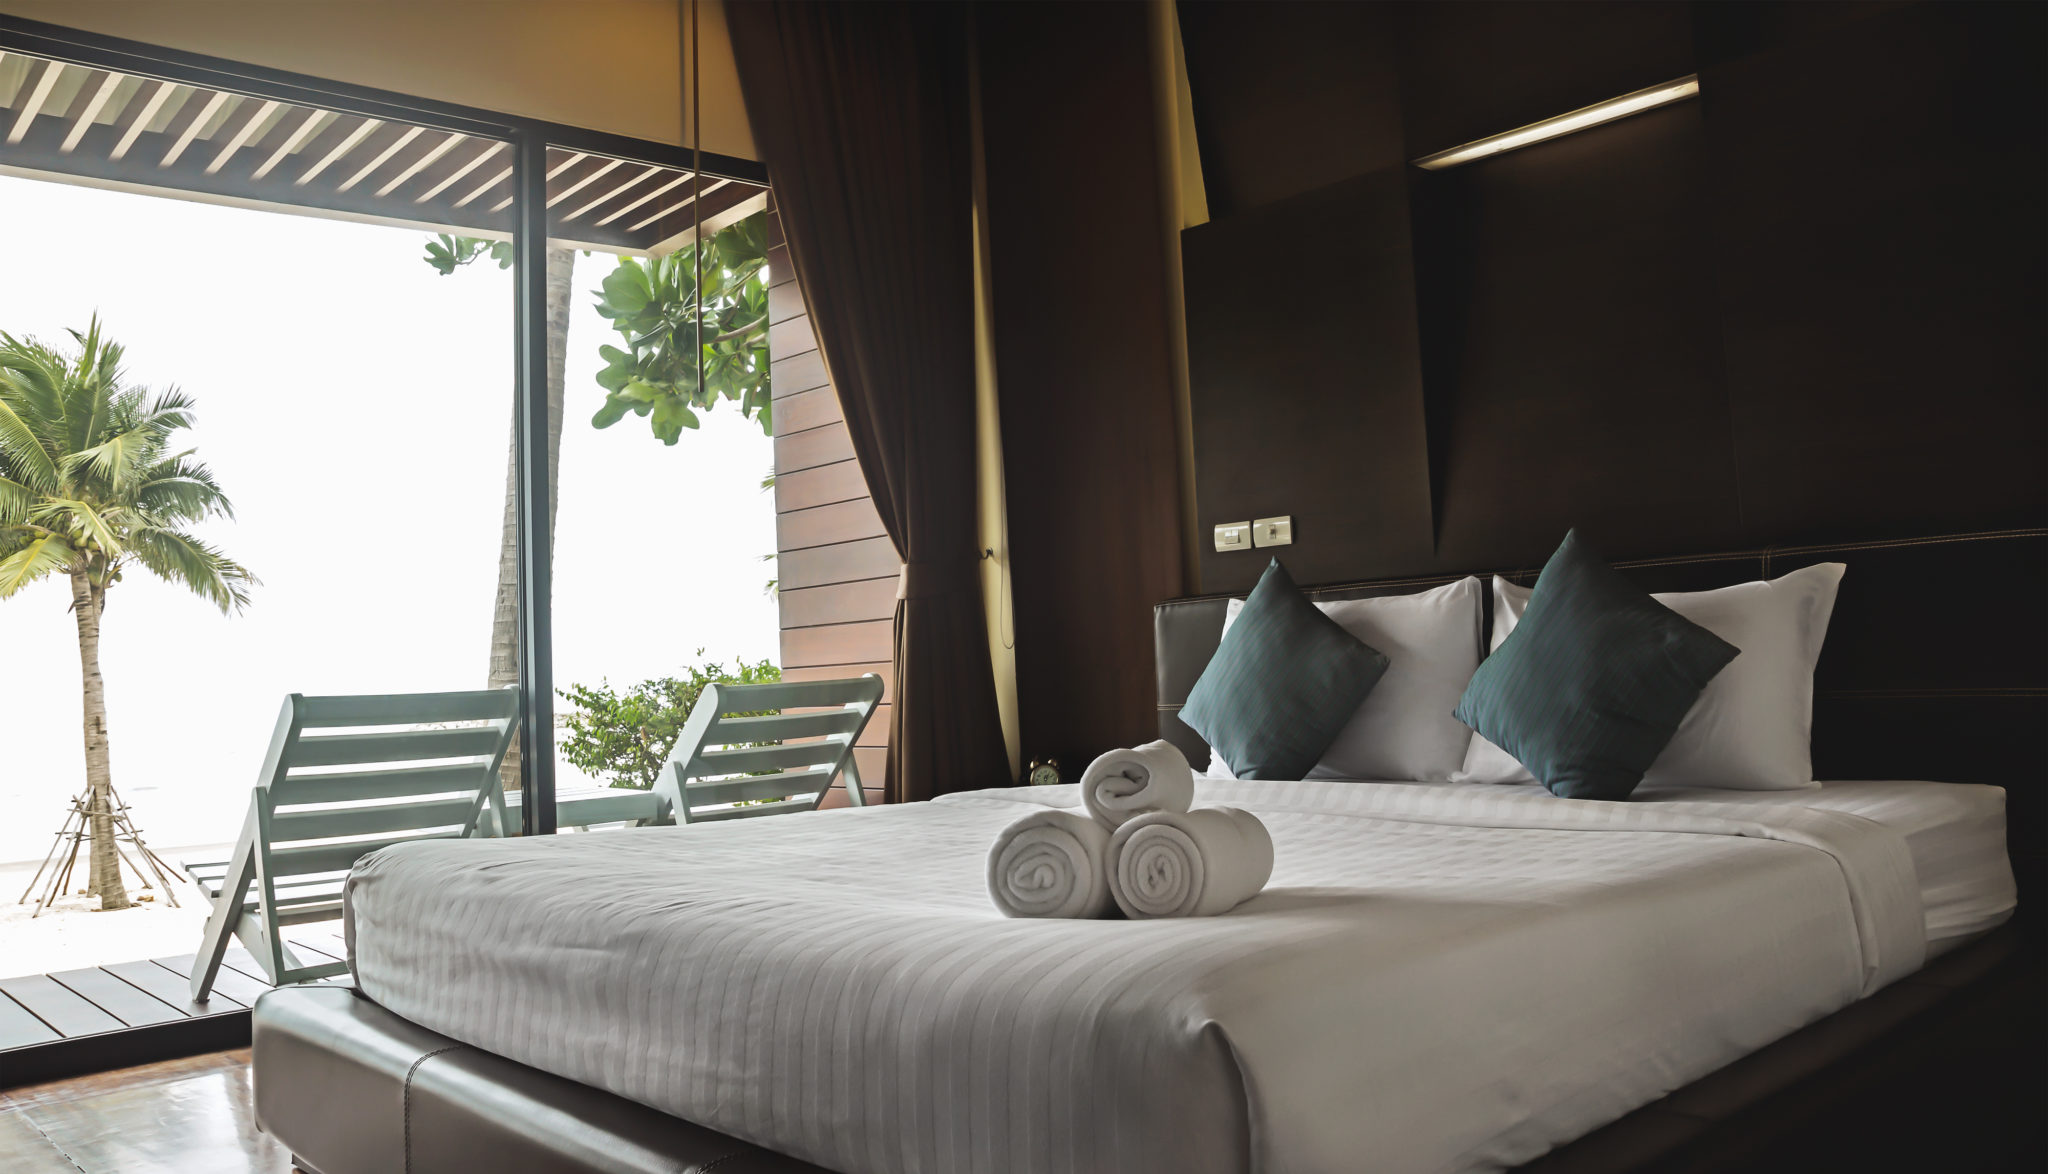 Reiseportale Test: Kategorie Hotels